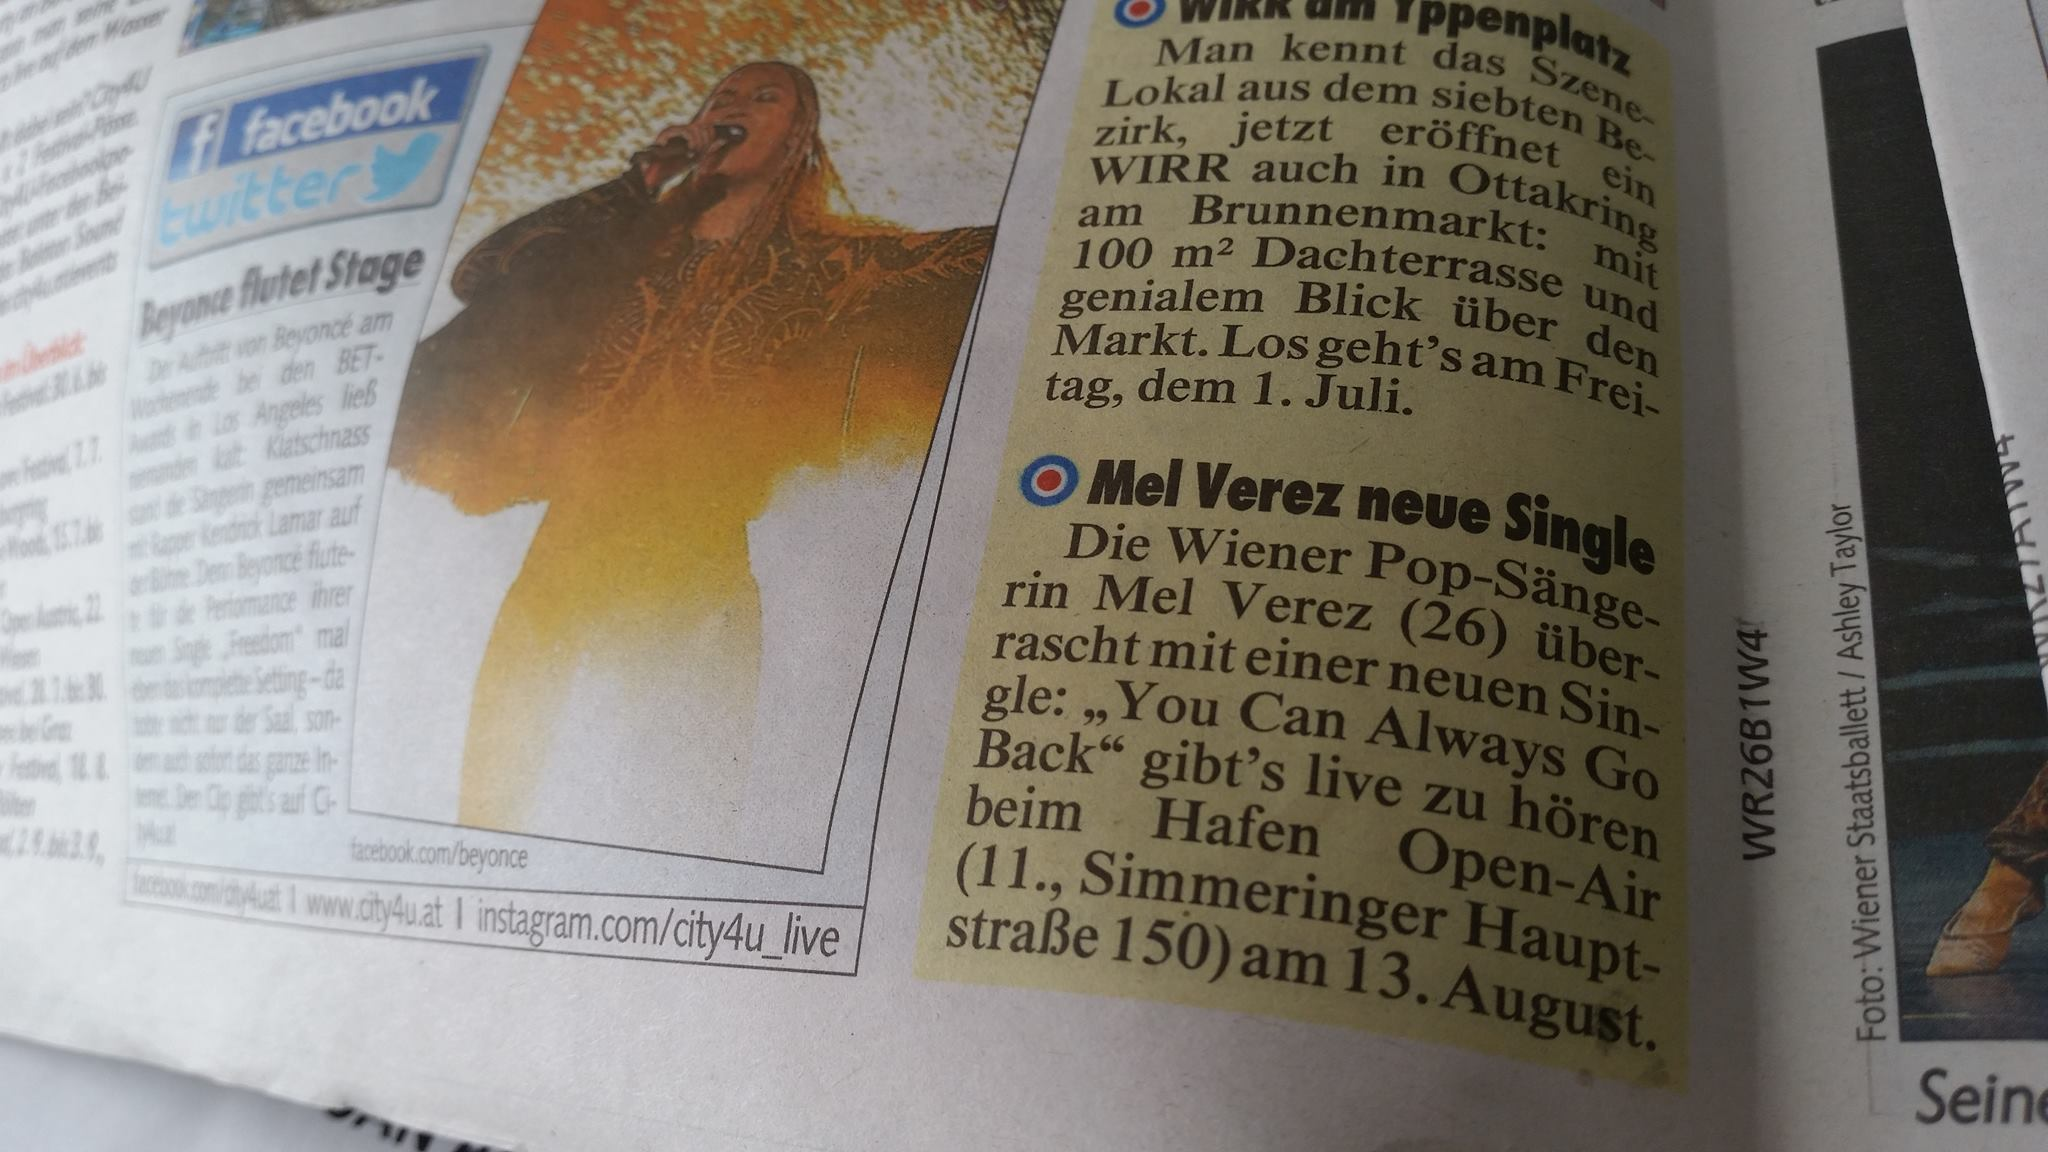 Kronen Zeitung 28.6.